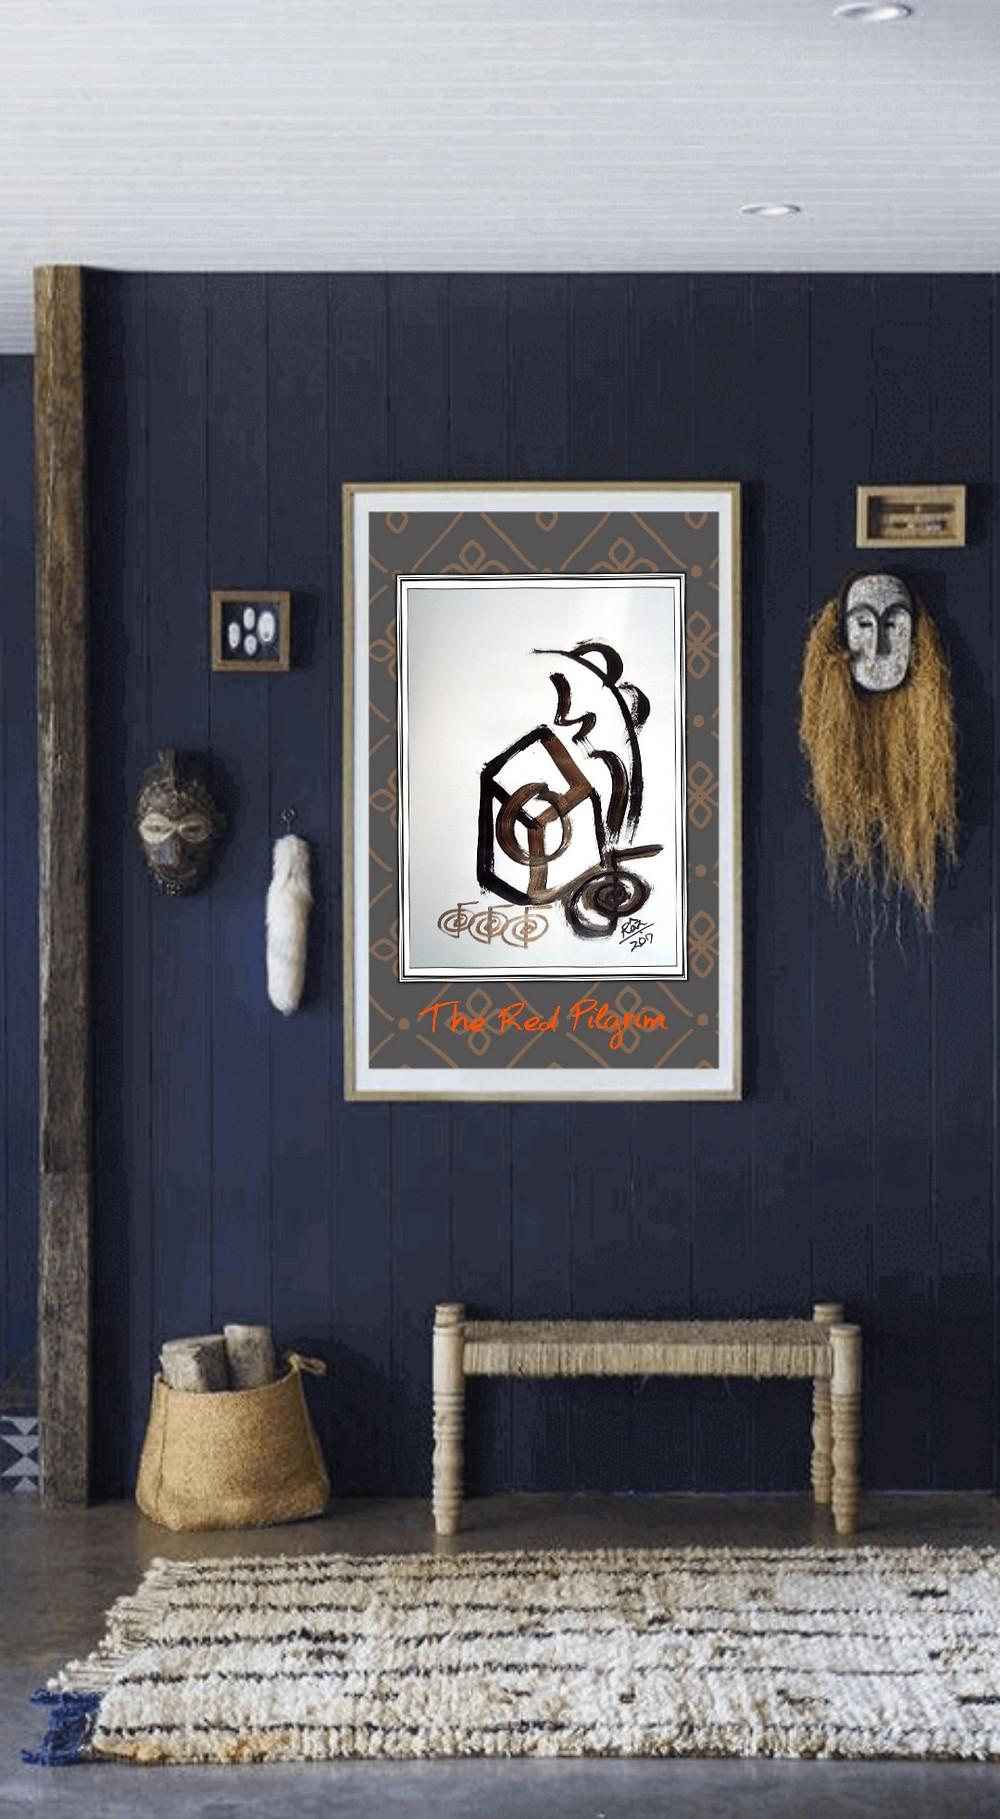 The Rejuvenating Anthakarna Reiki painting displayed in Boho decor